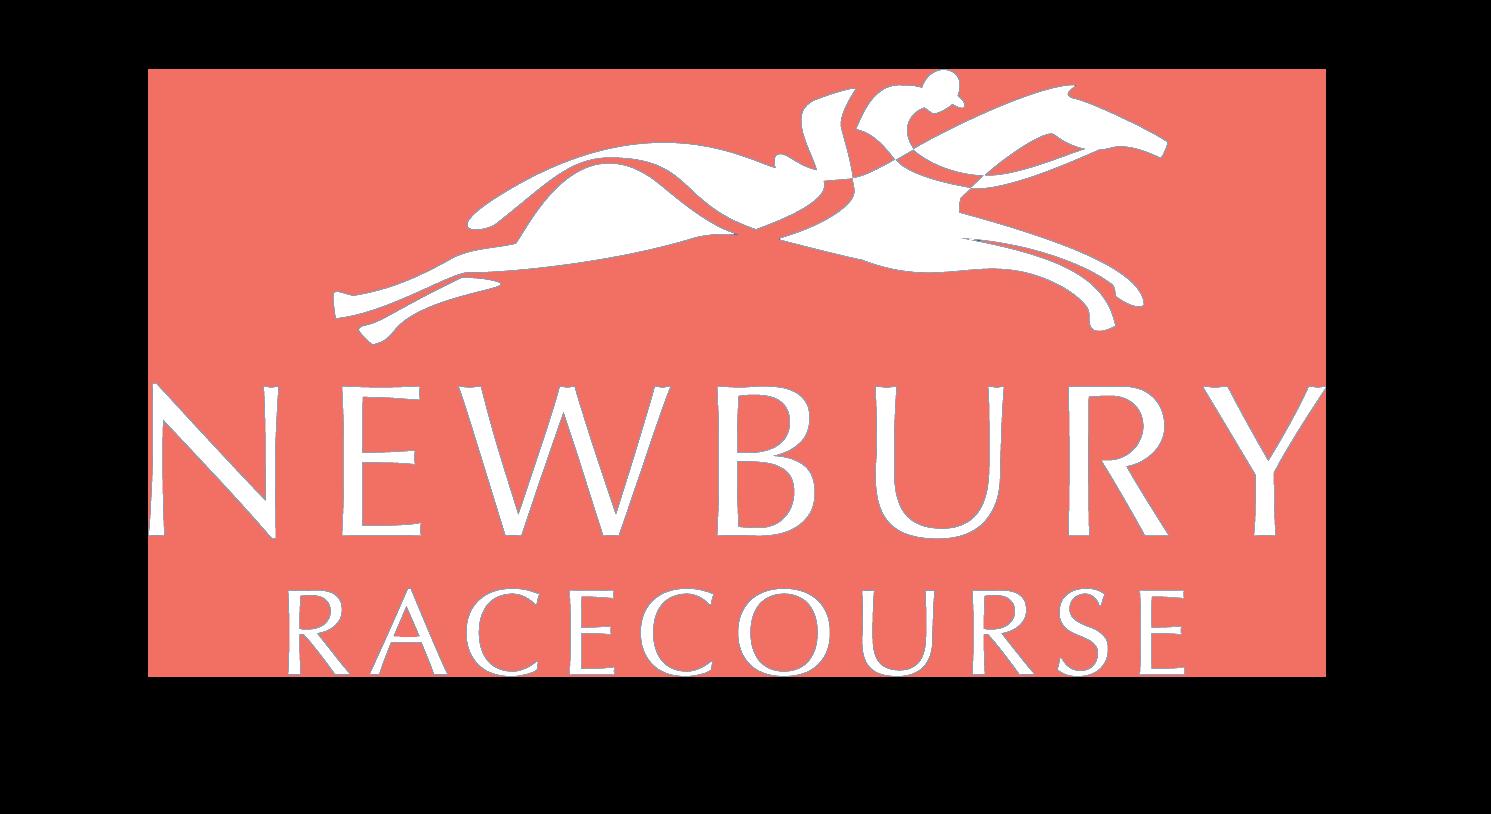 Newbury_racecourse_navy_white_spot-2767C.png